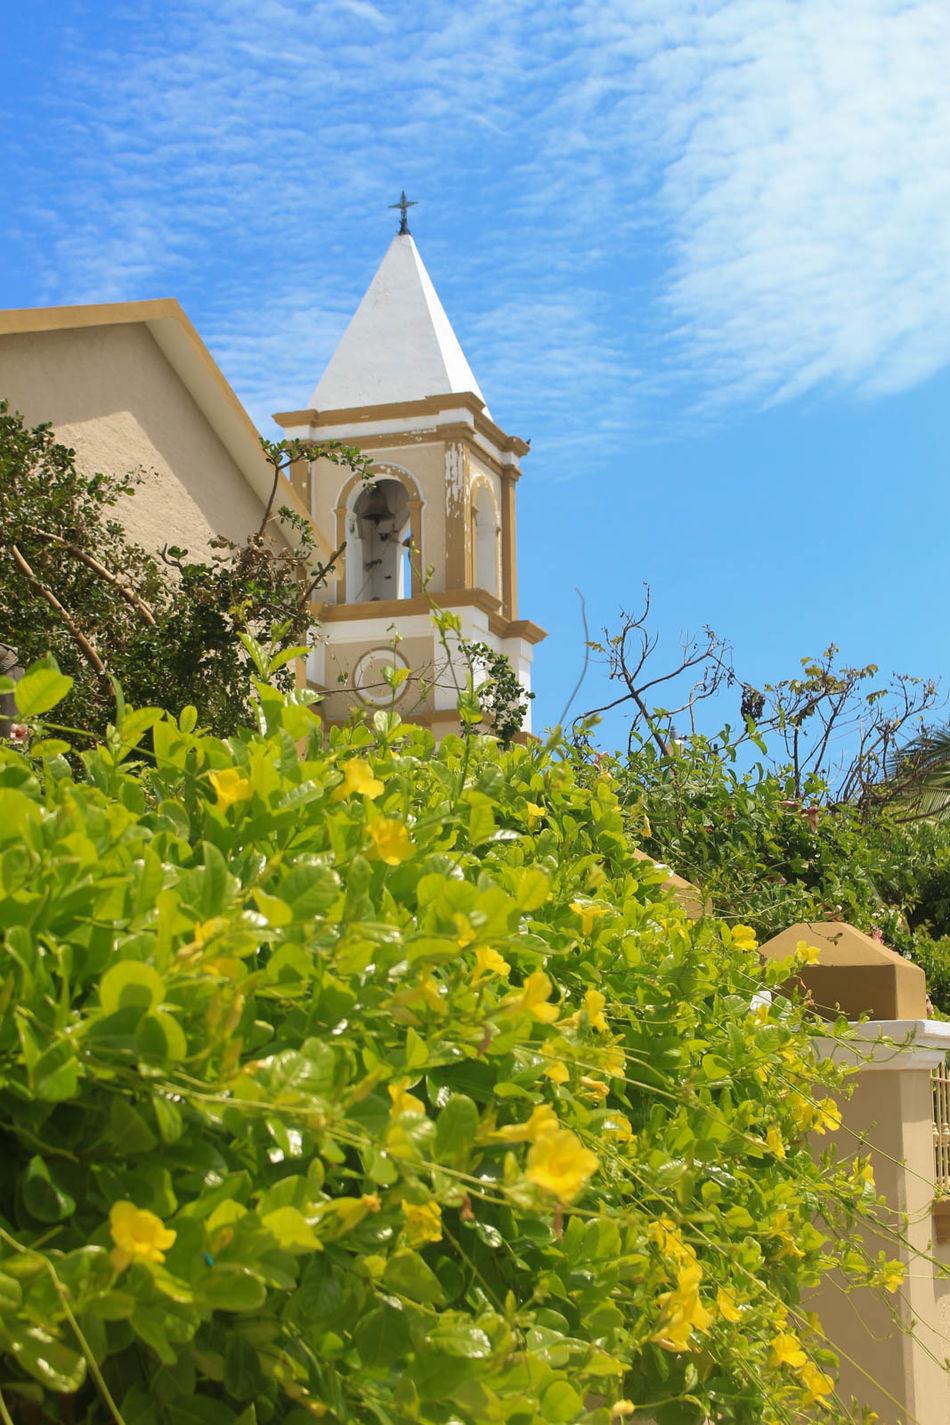 Iglesia San José del Cabo Architecture Blue Sky Built Structure Clouds Day Green Color Los Cabos Mexico No People Outdoors Religion San José Del Cabo Sky Vacations Visit Mexico